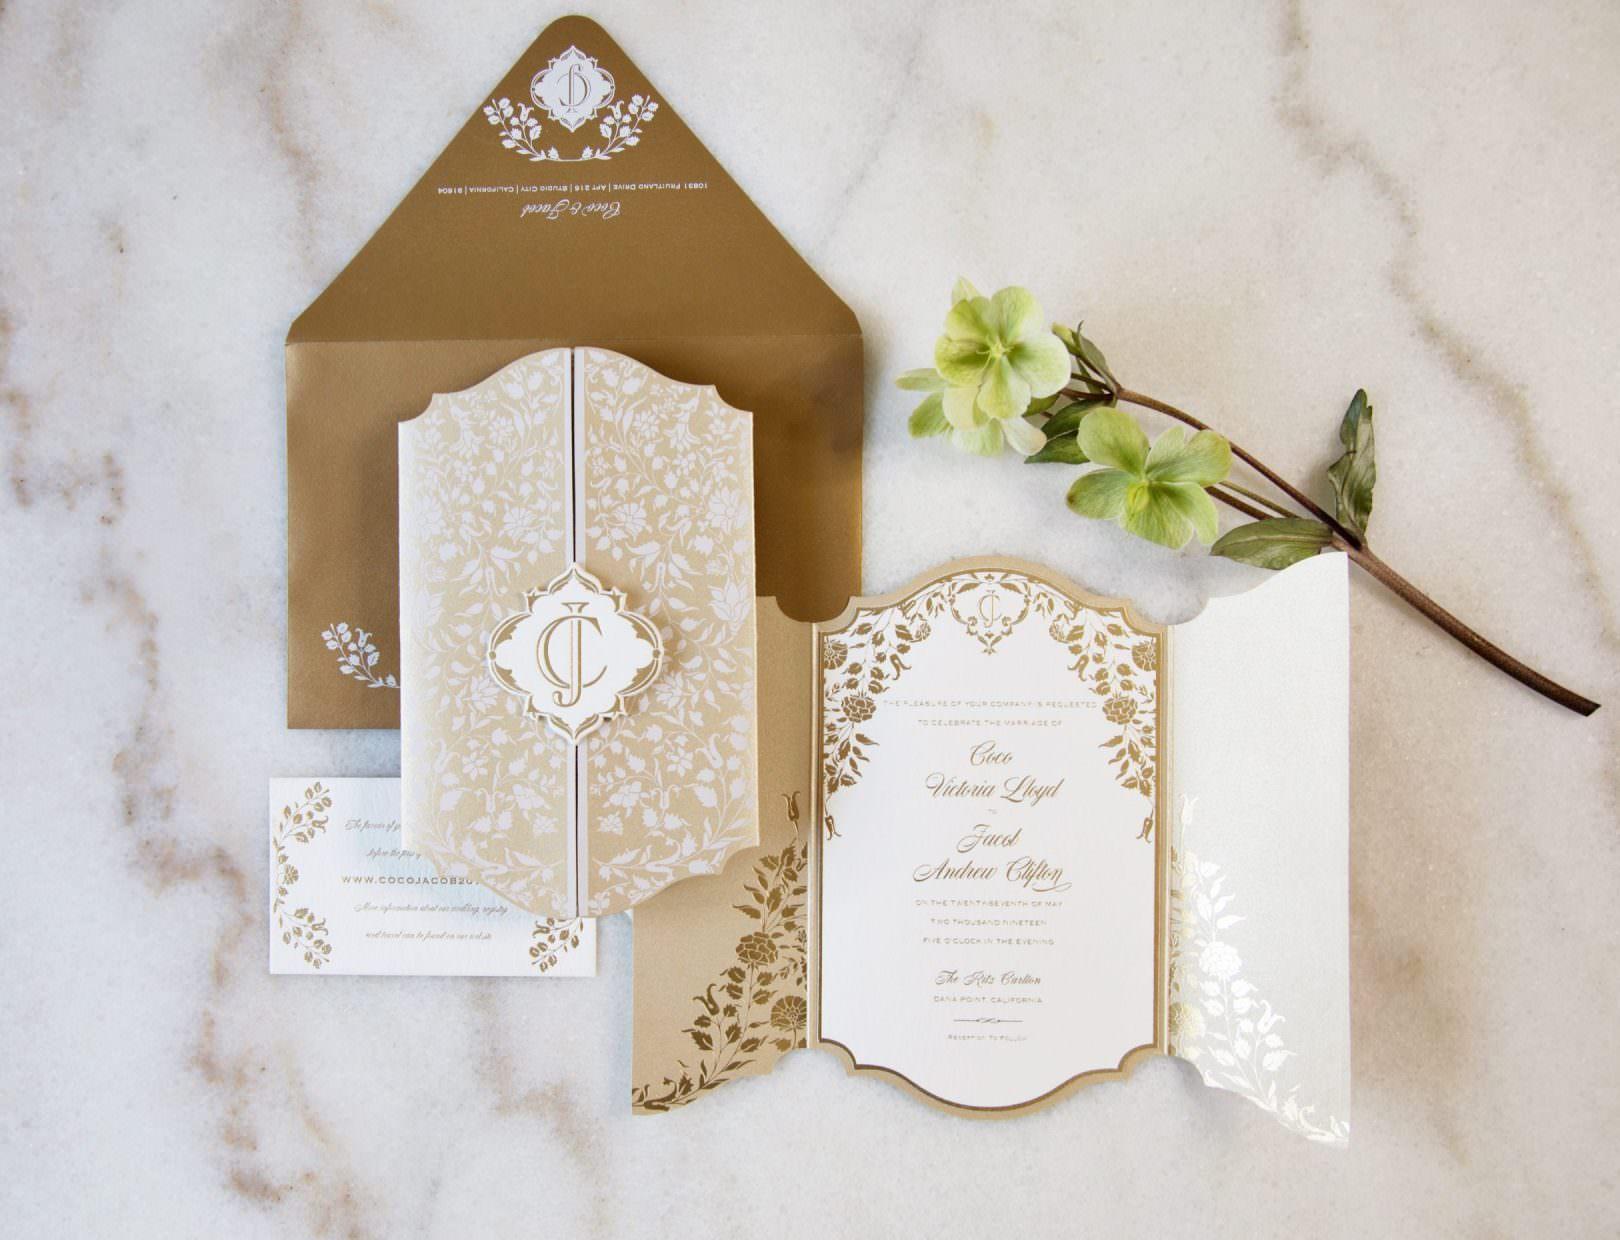 Wedding Invitation For Wedding At The Ritz-Carlton